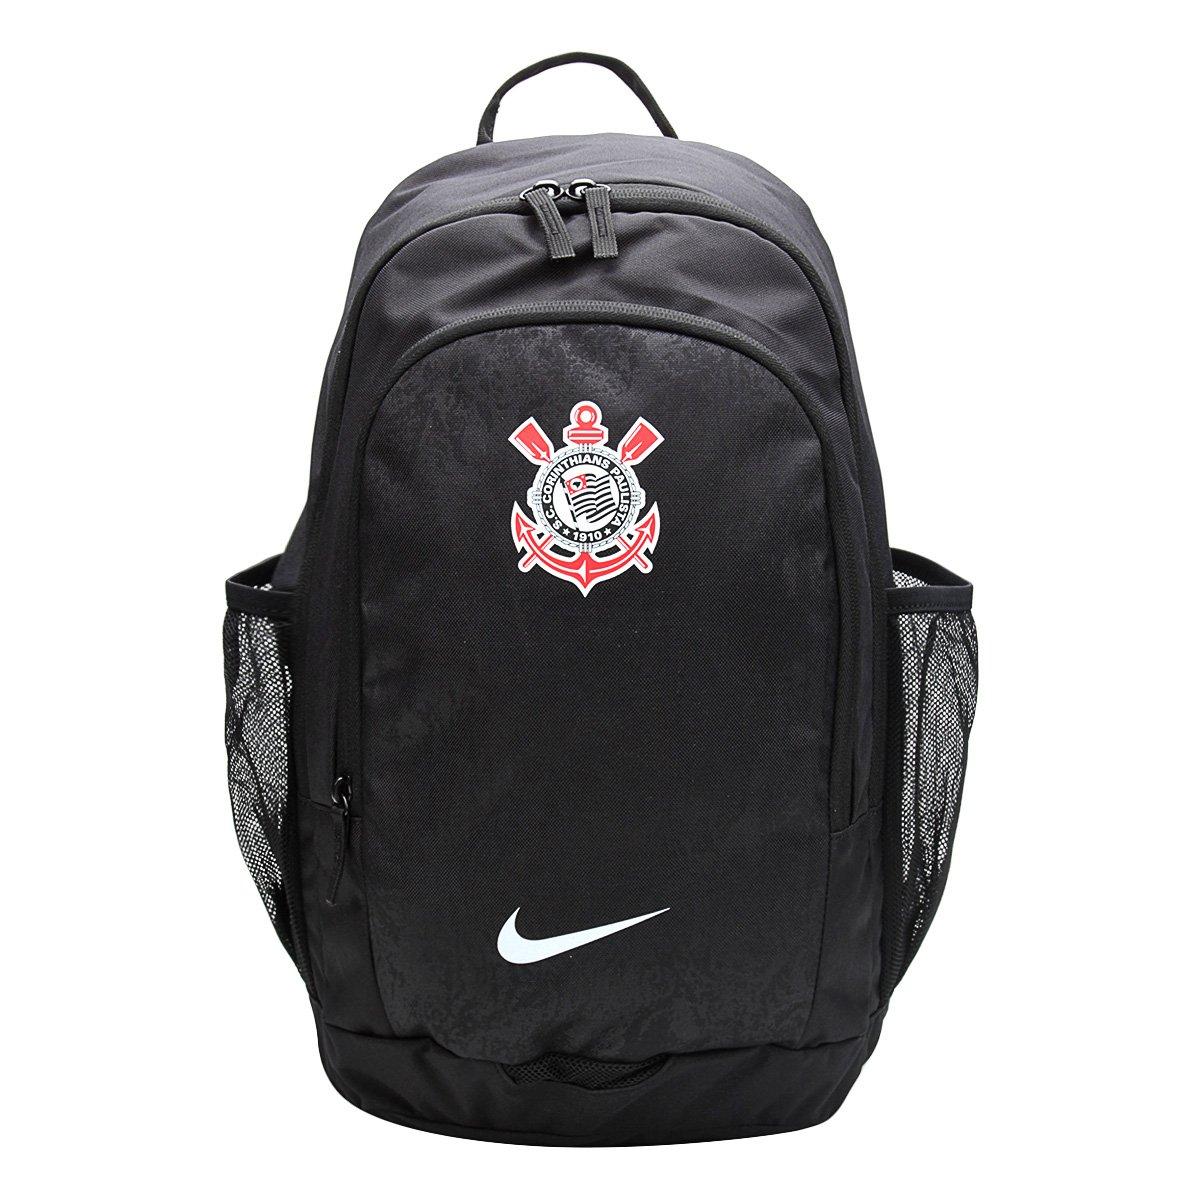 47d80248b Mochila Corinthians Nike Stadium | Shop Timão